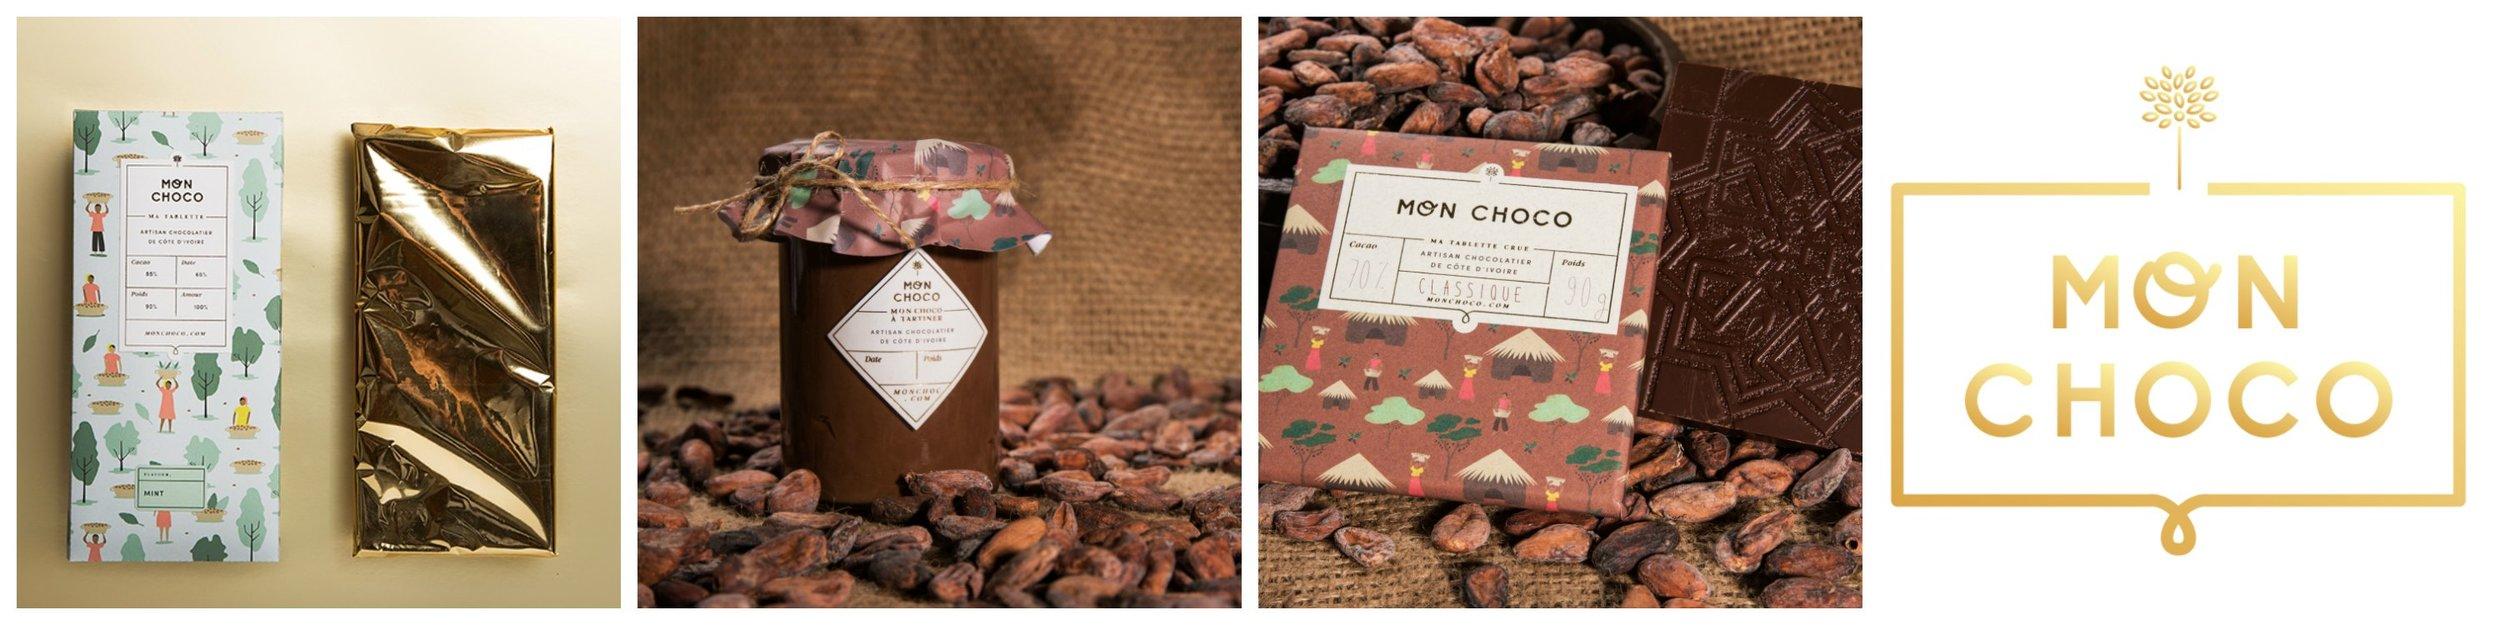 MonChoco-Collage3.jpg